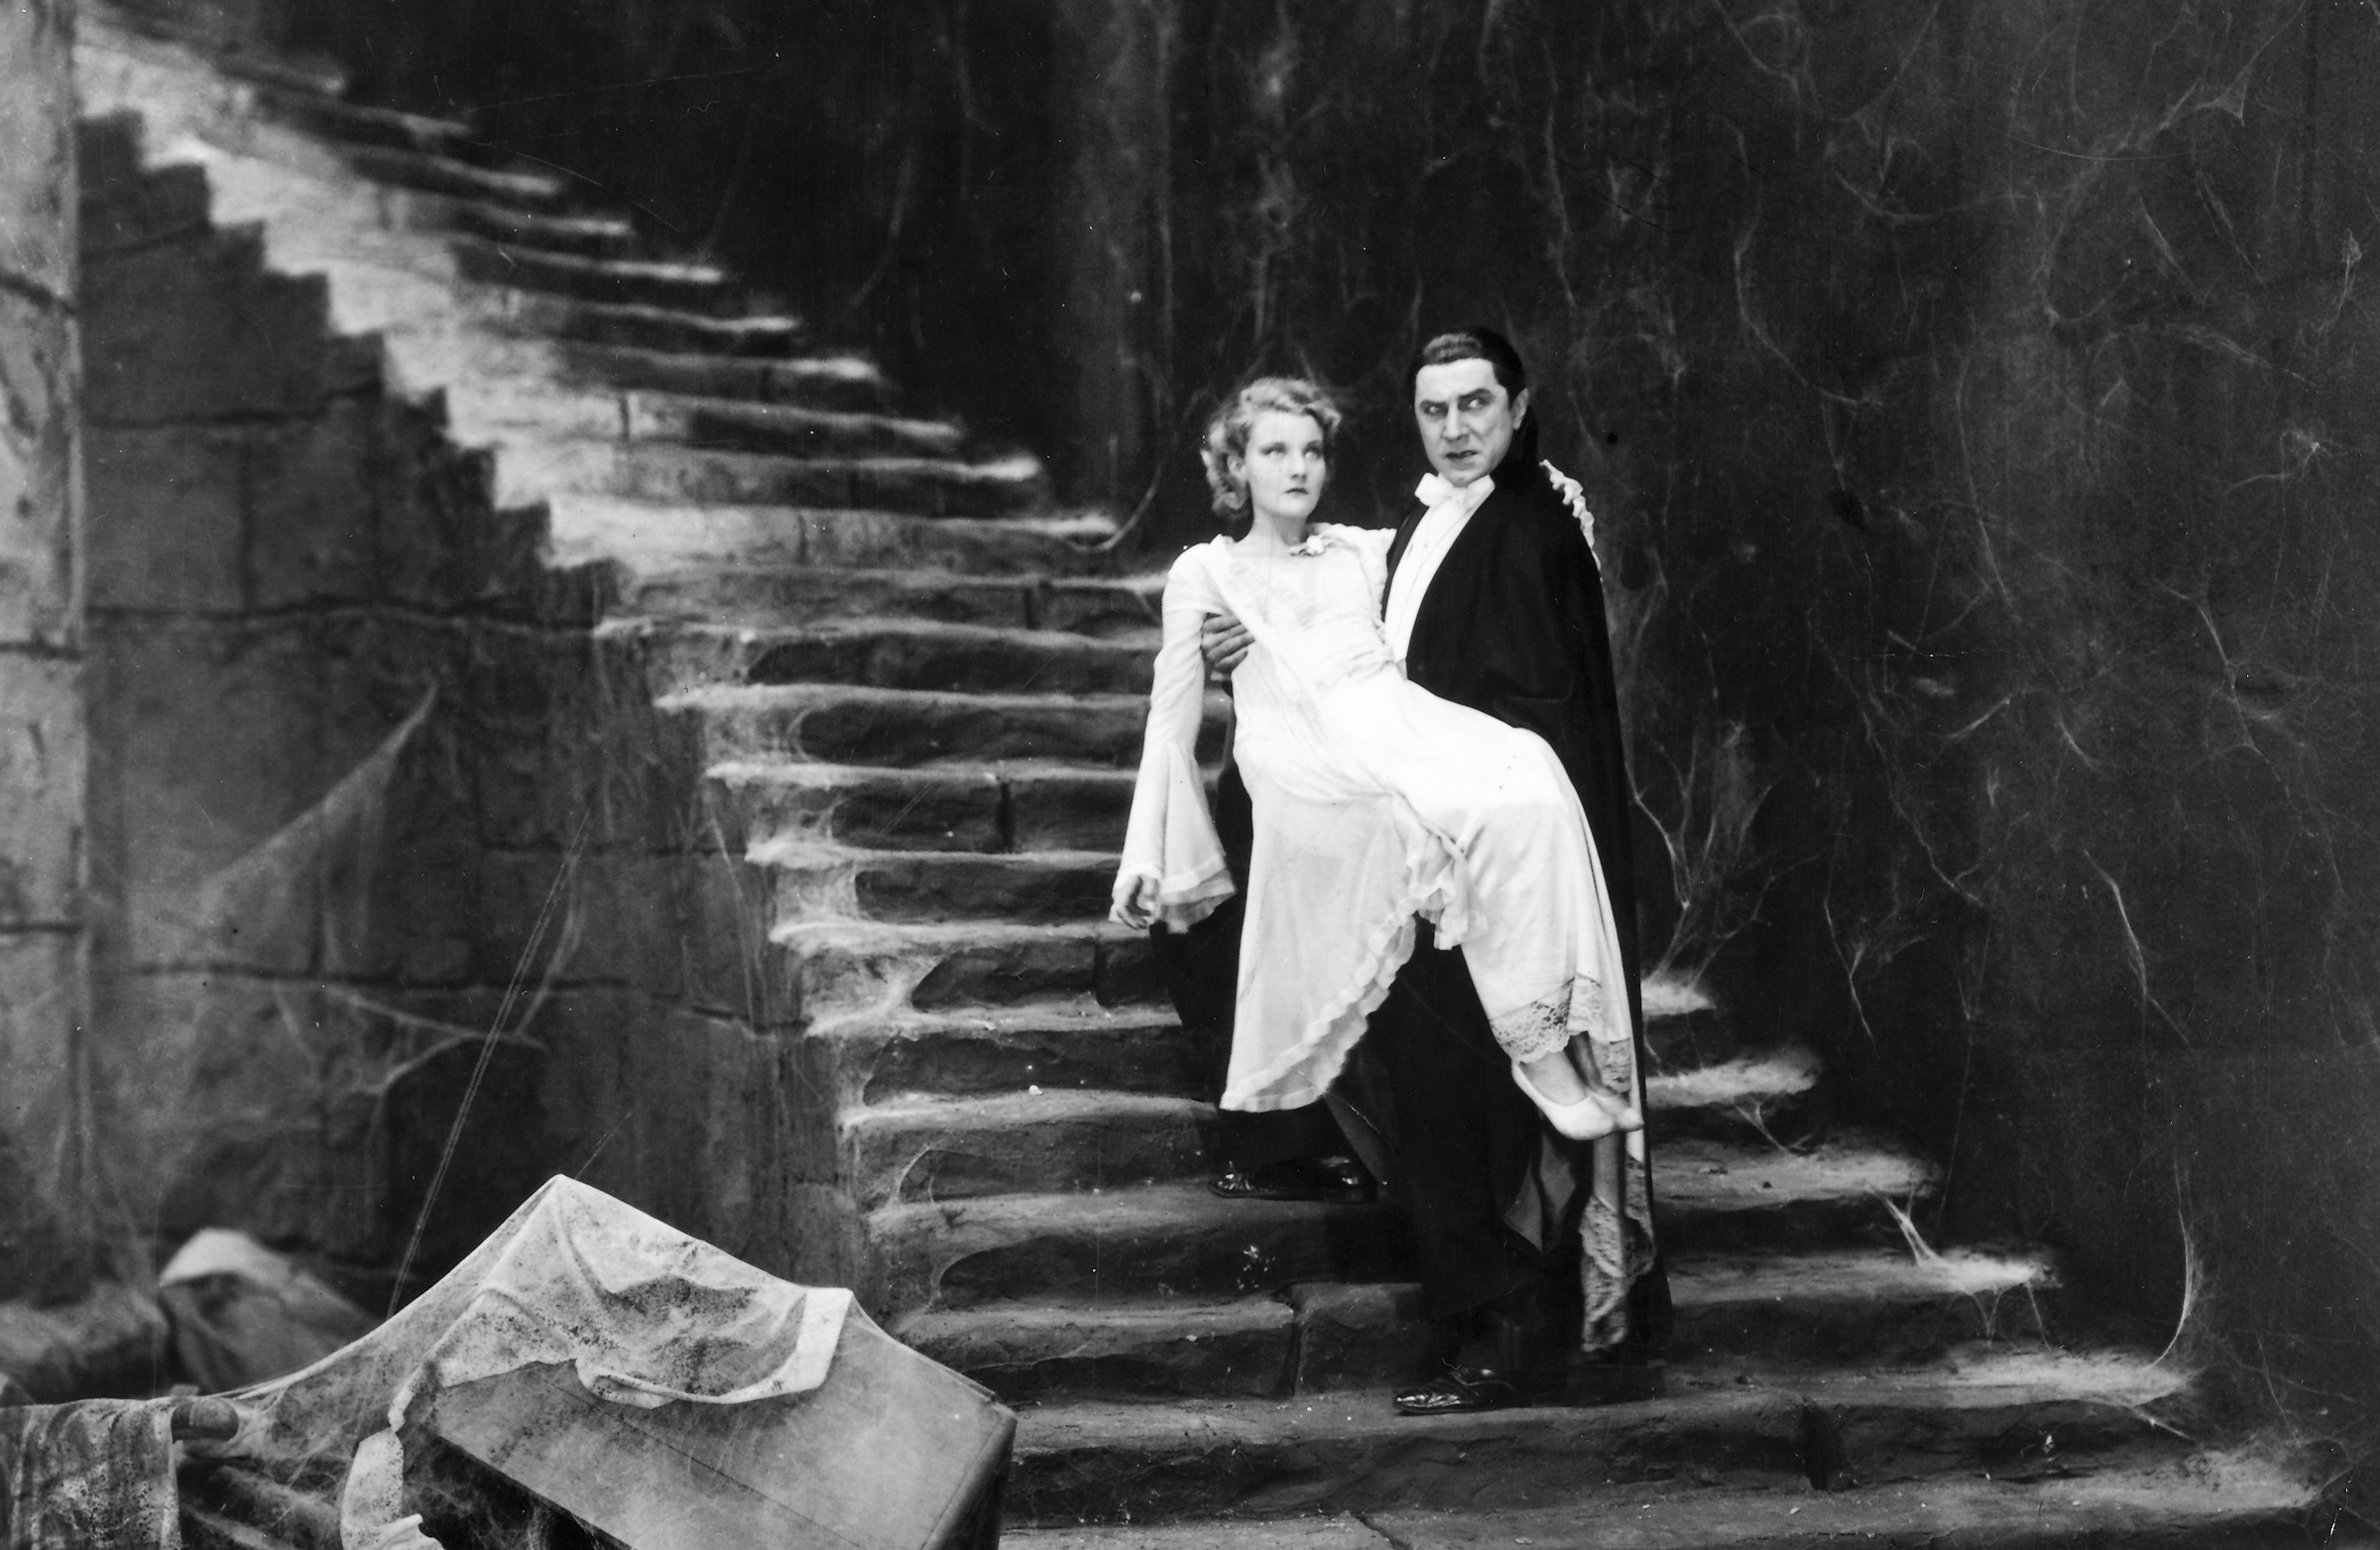 Dracula1931.jpg